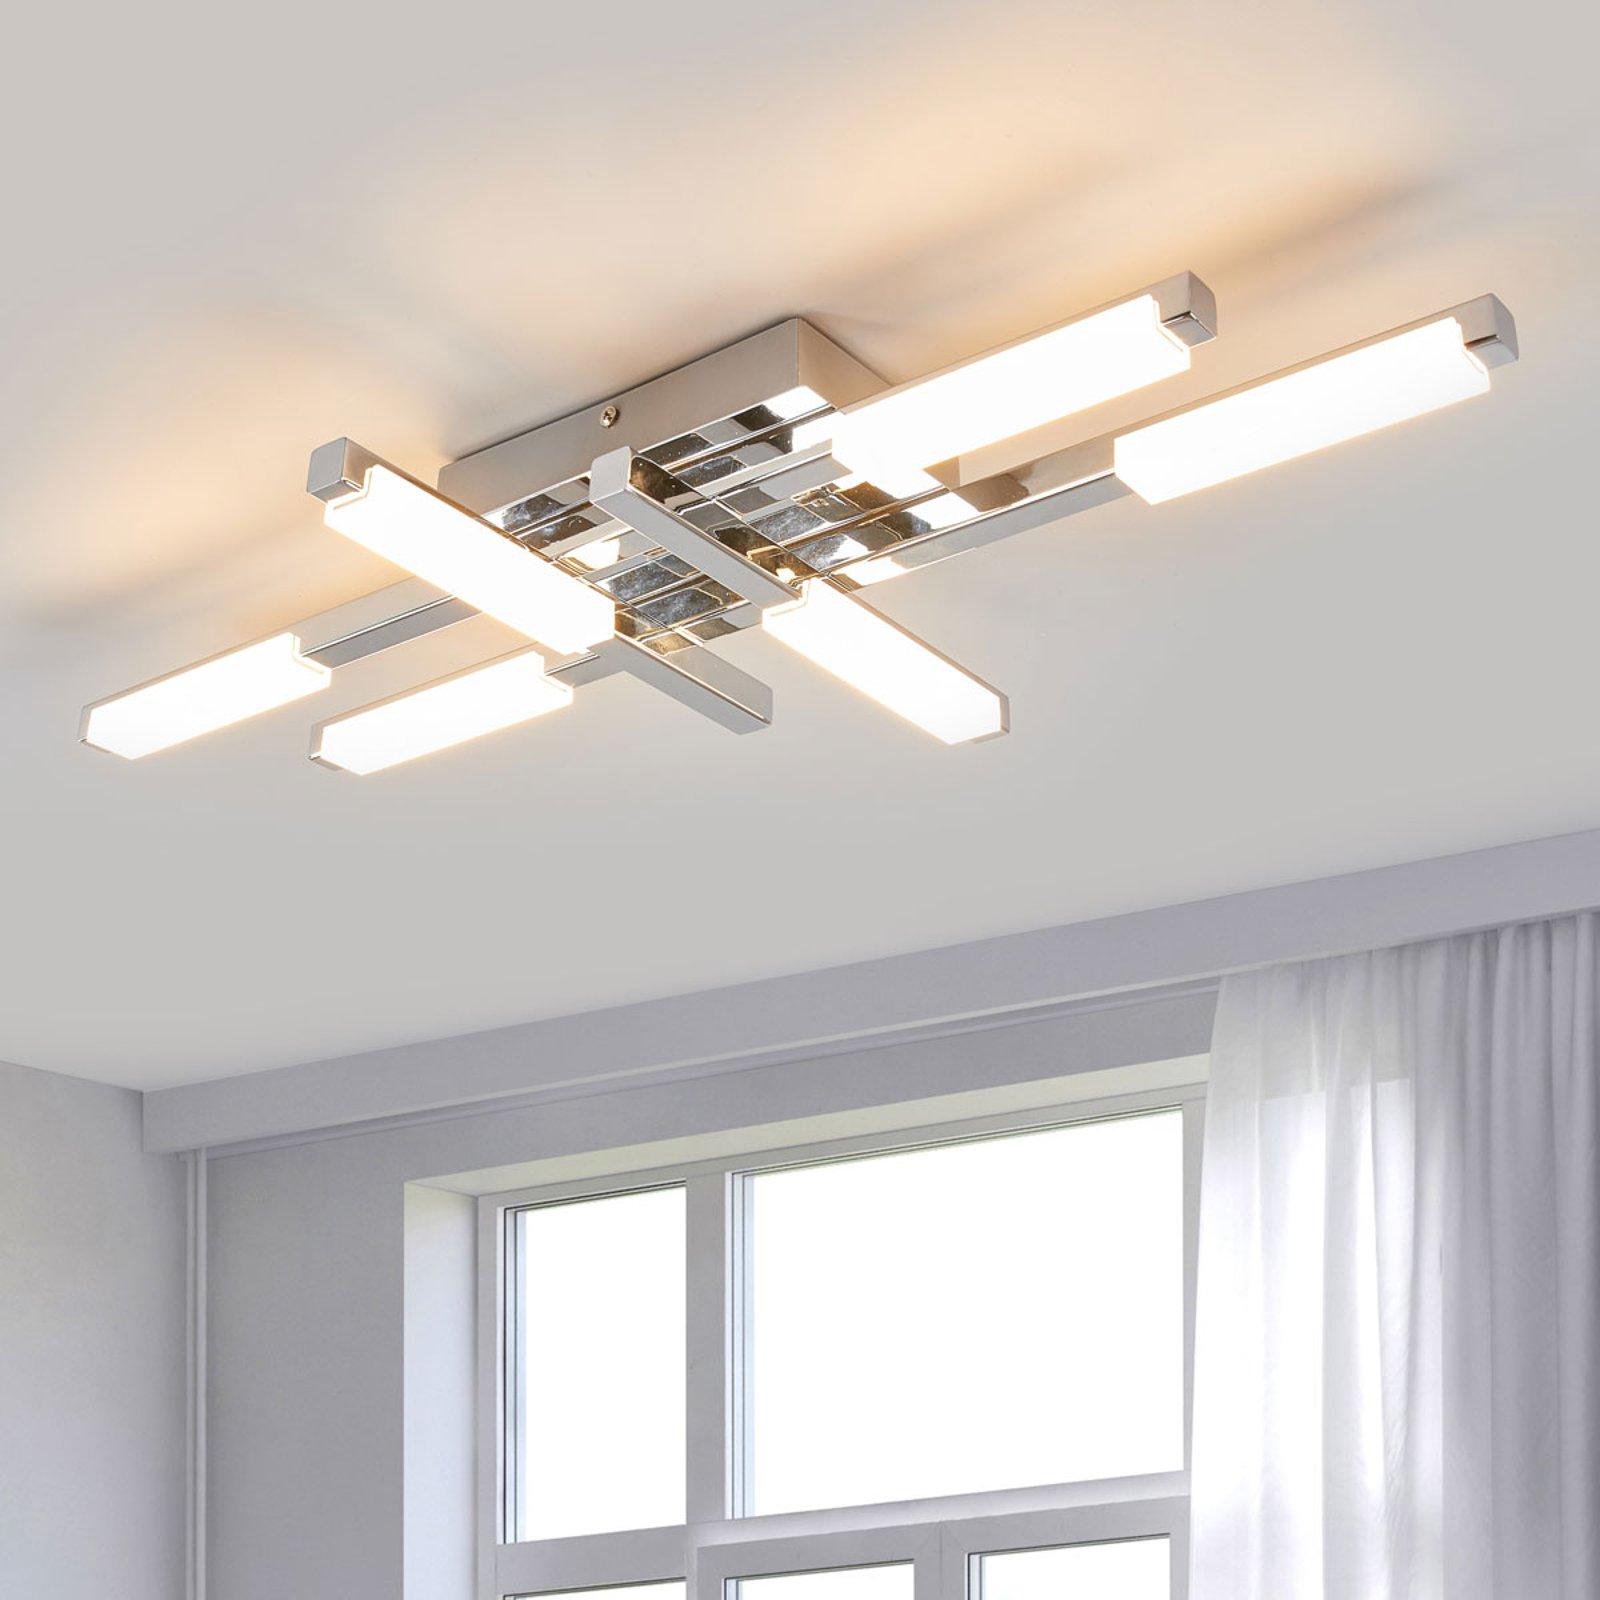 LED-taklampe Patrik med kraftig lys, IP44